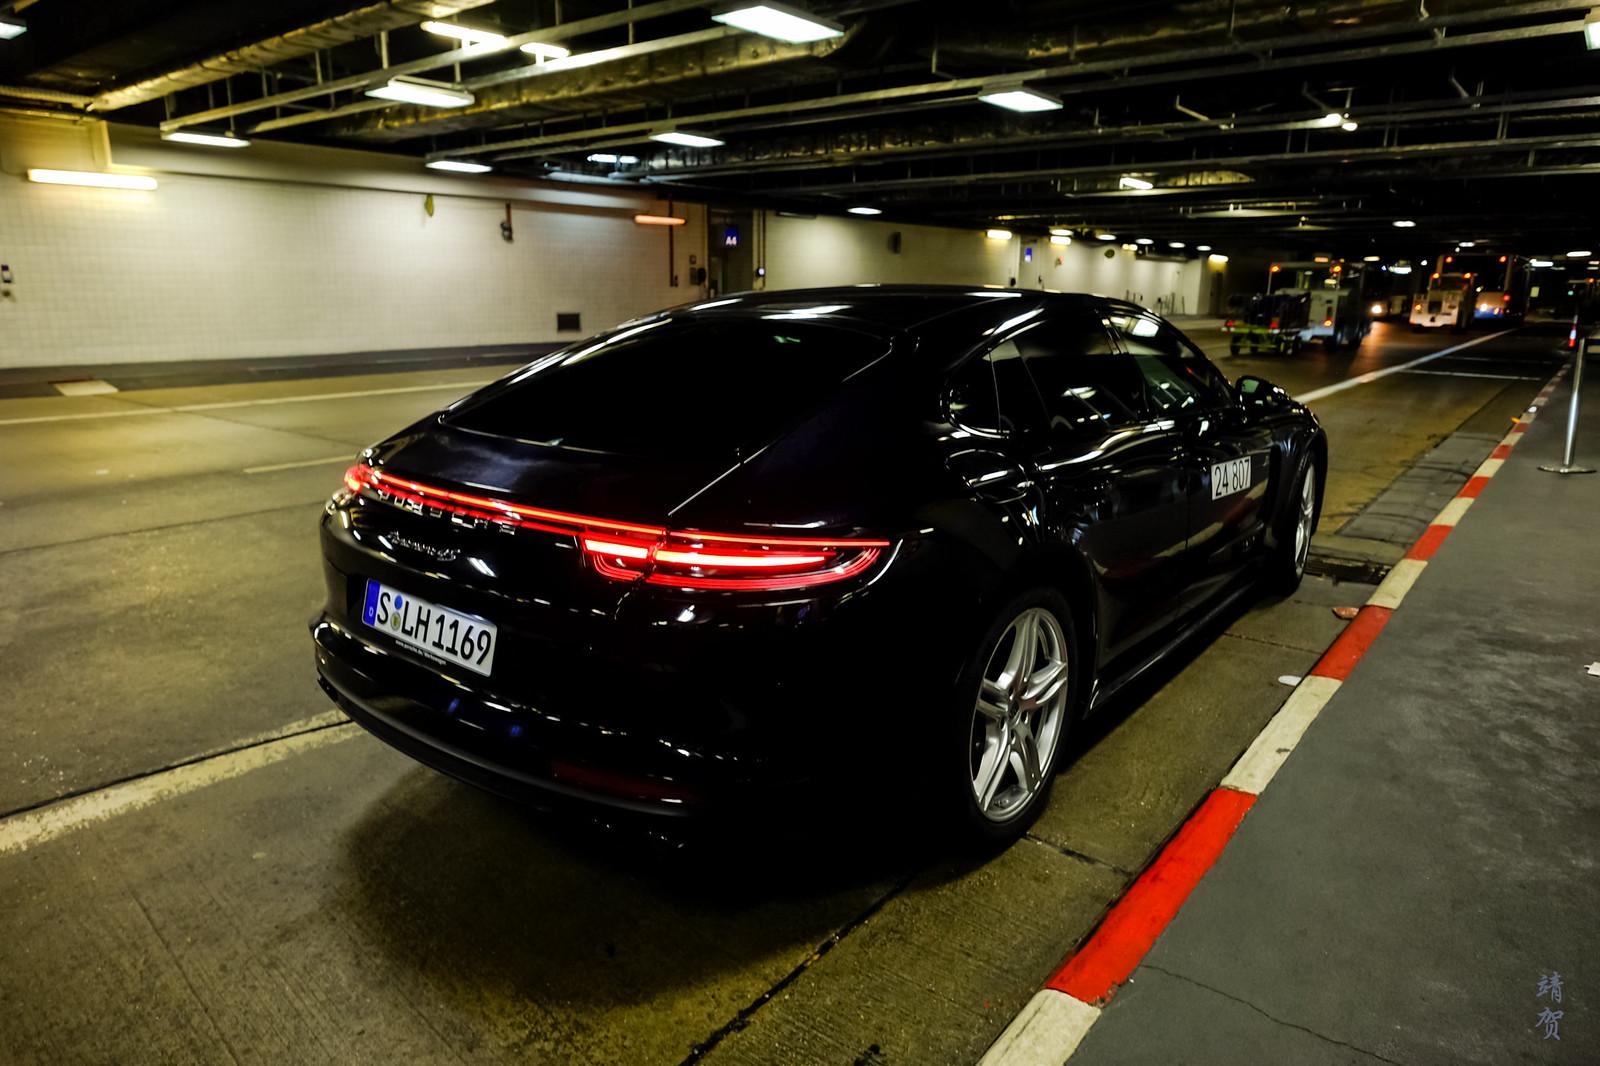 Porsche Panamera chauffeur service